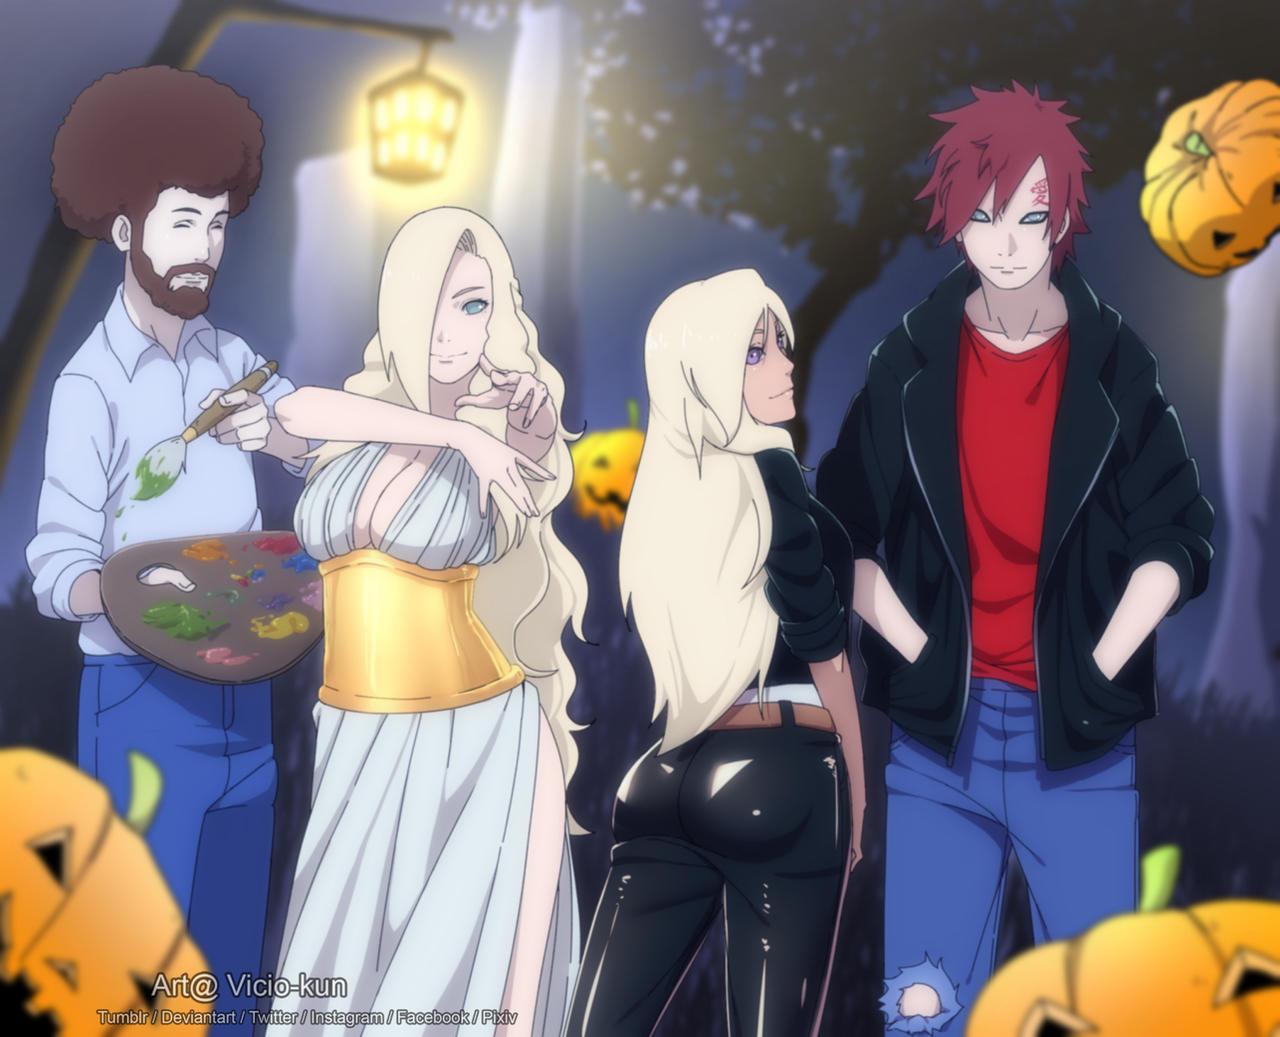 Commission - Konoha's Halloween Party by vicio-kun